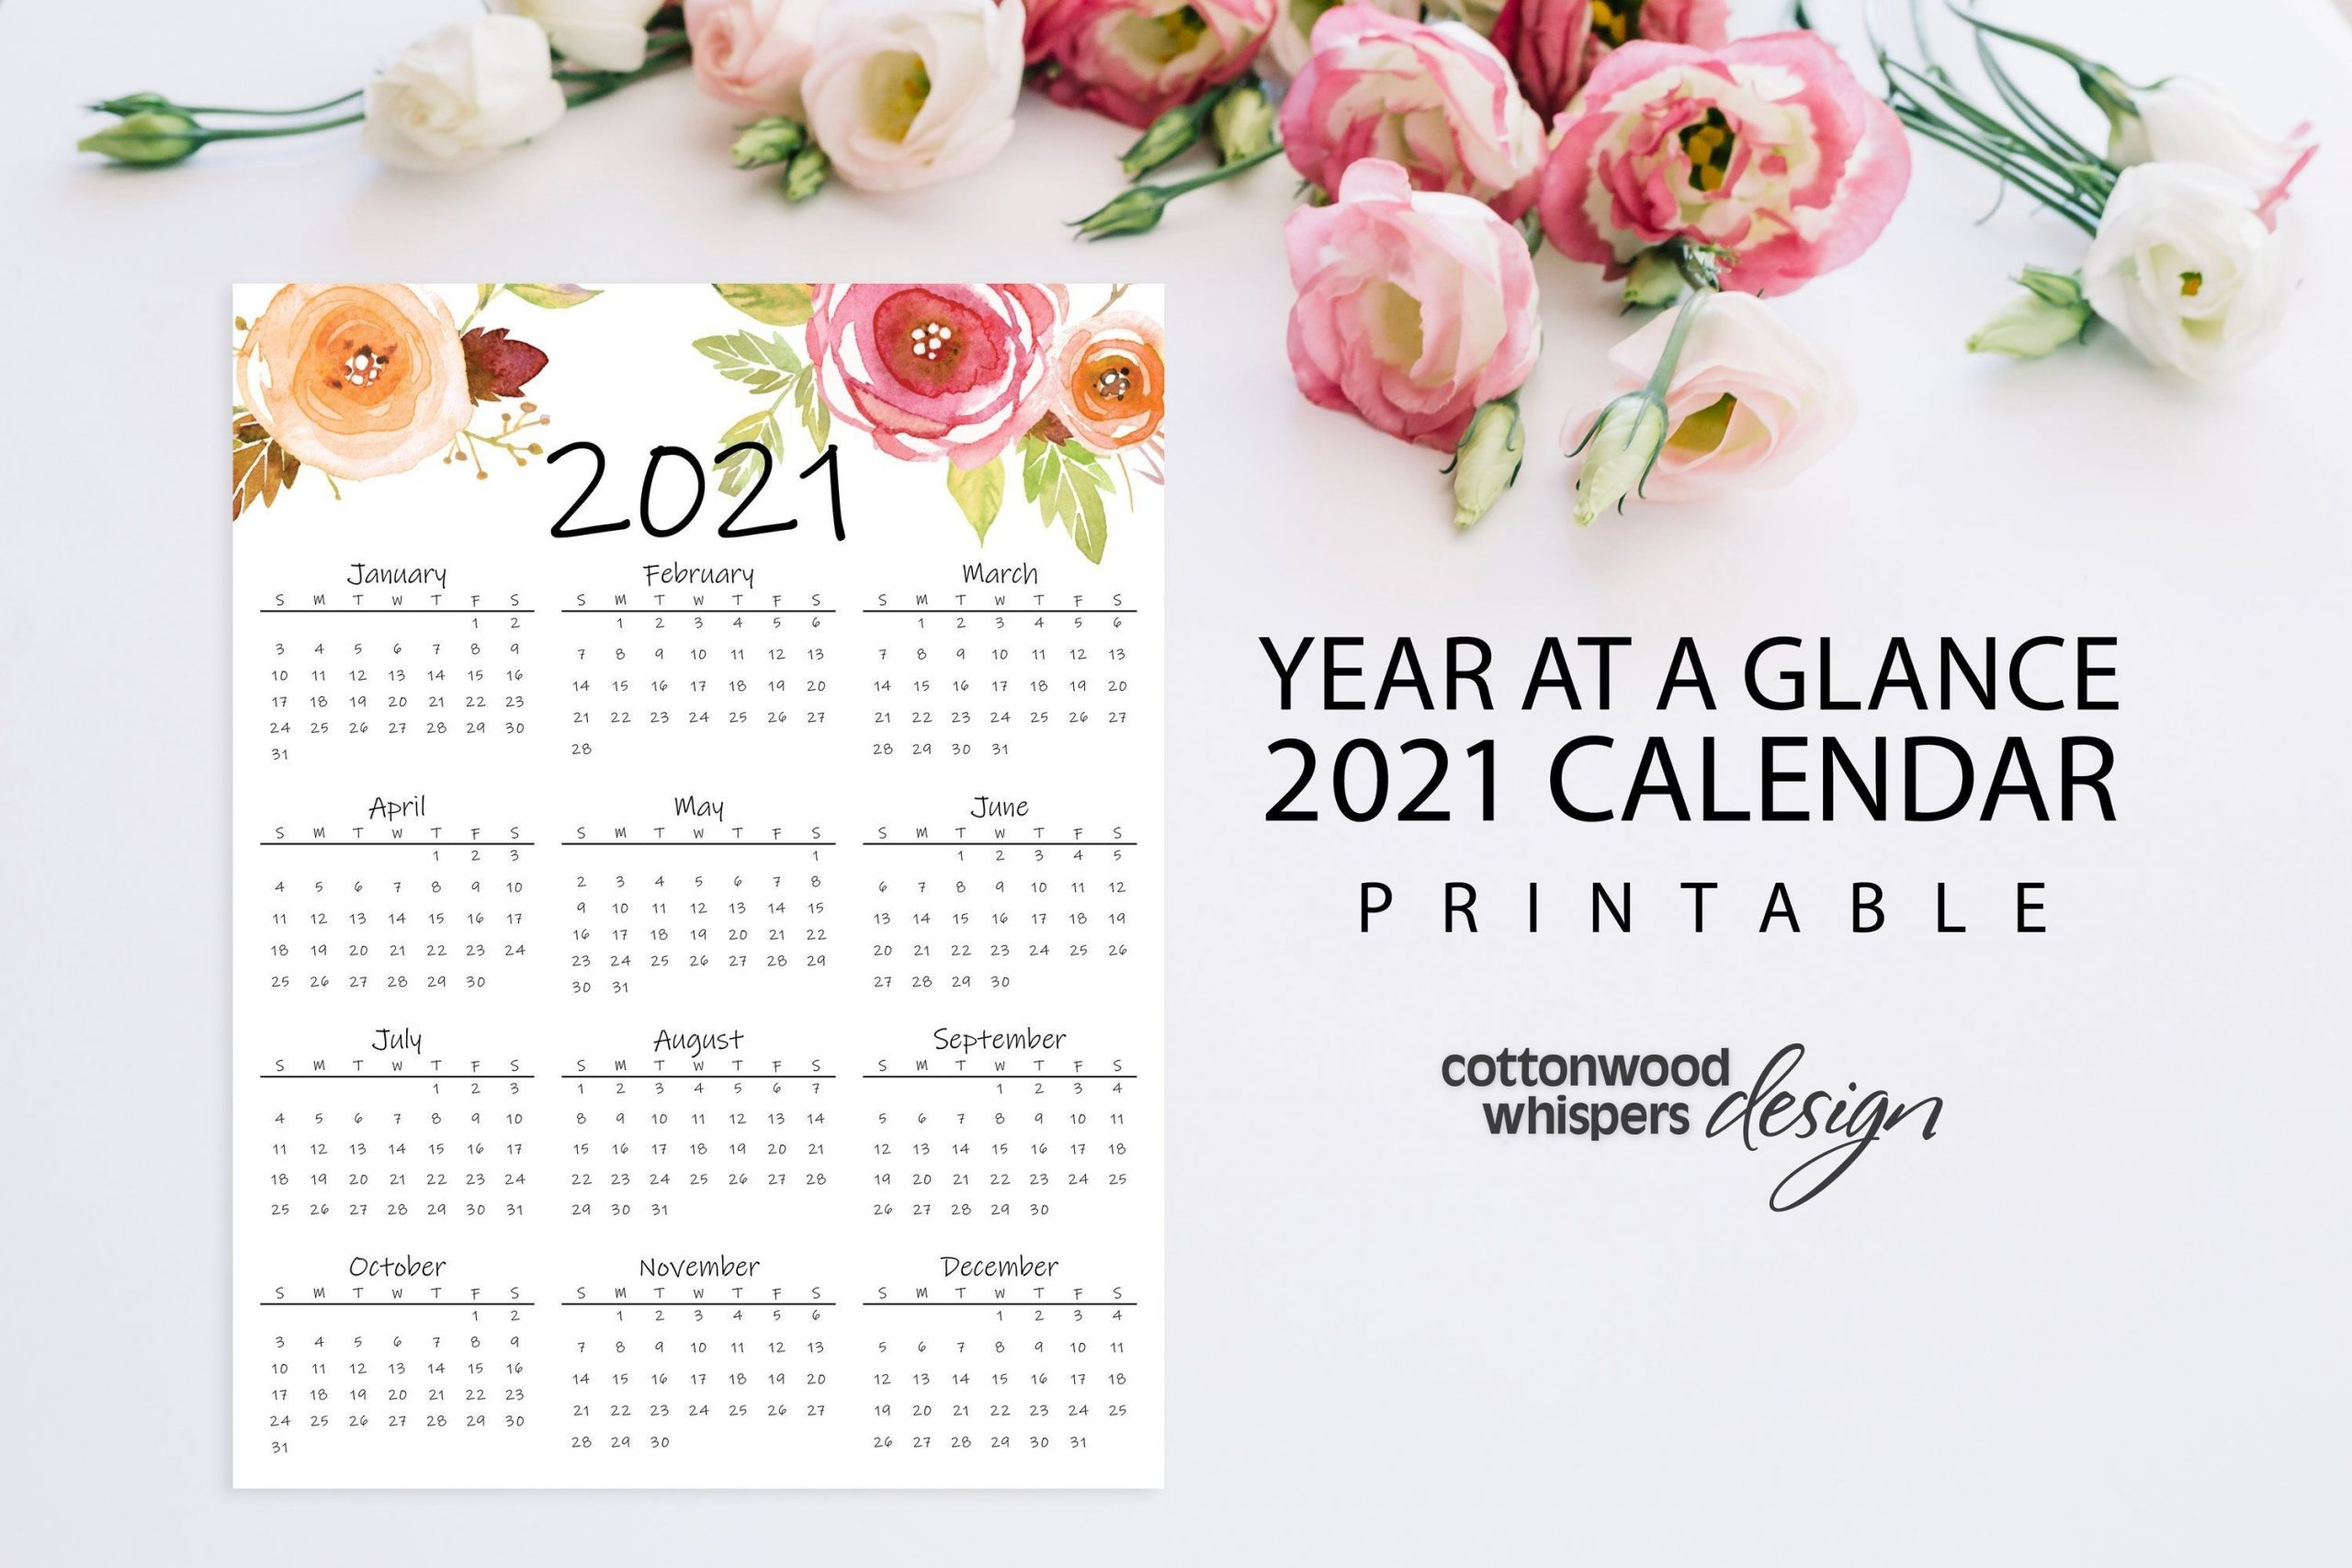 Year At A Glance Calendar 2021 Printable Calendar Letter